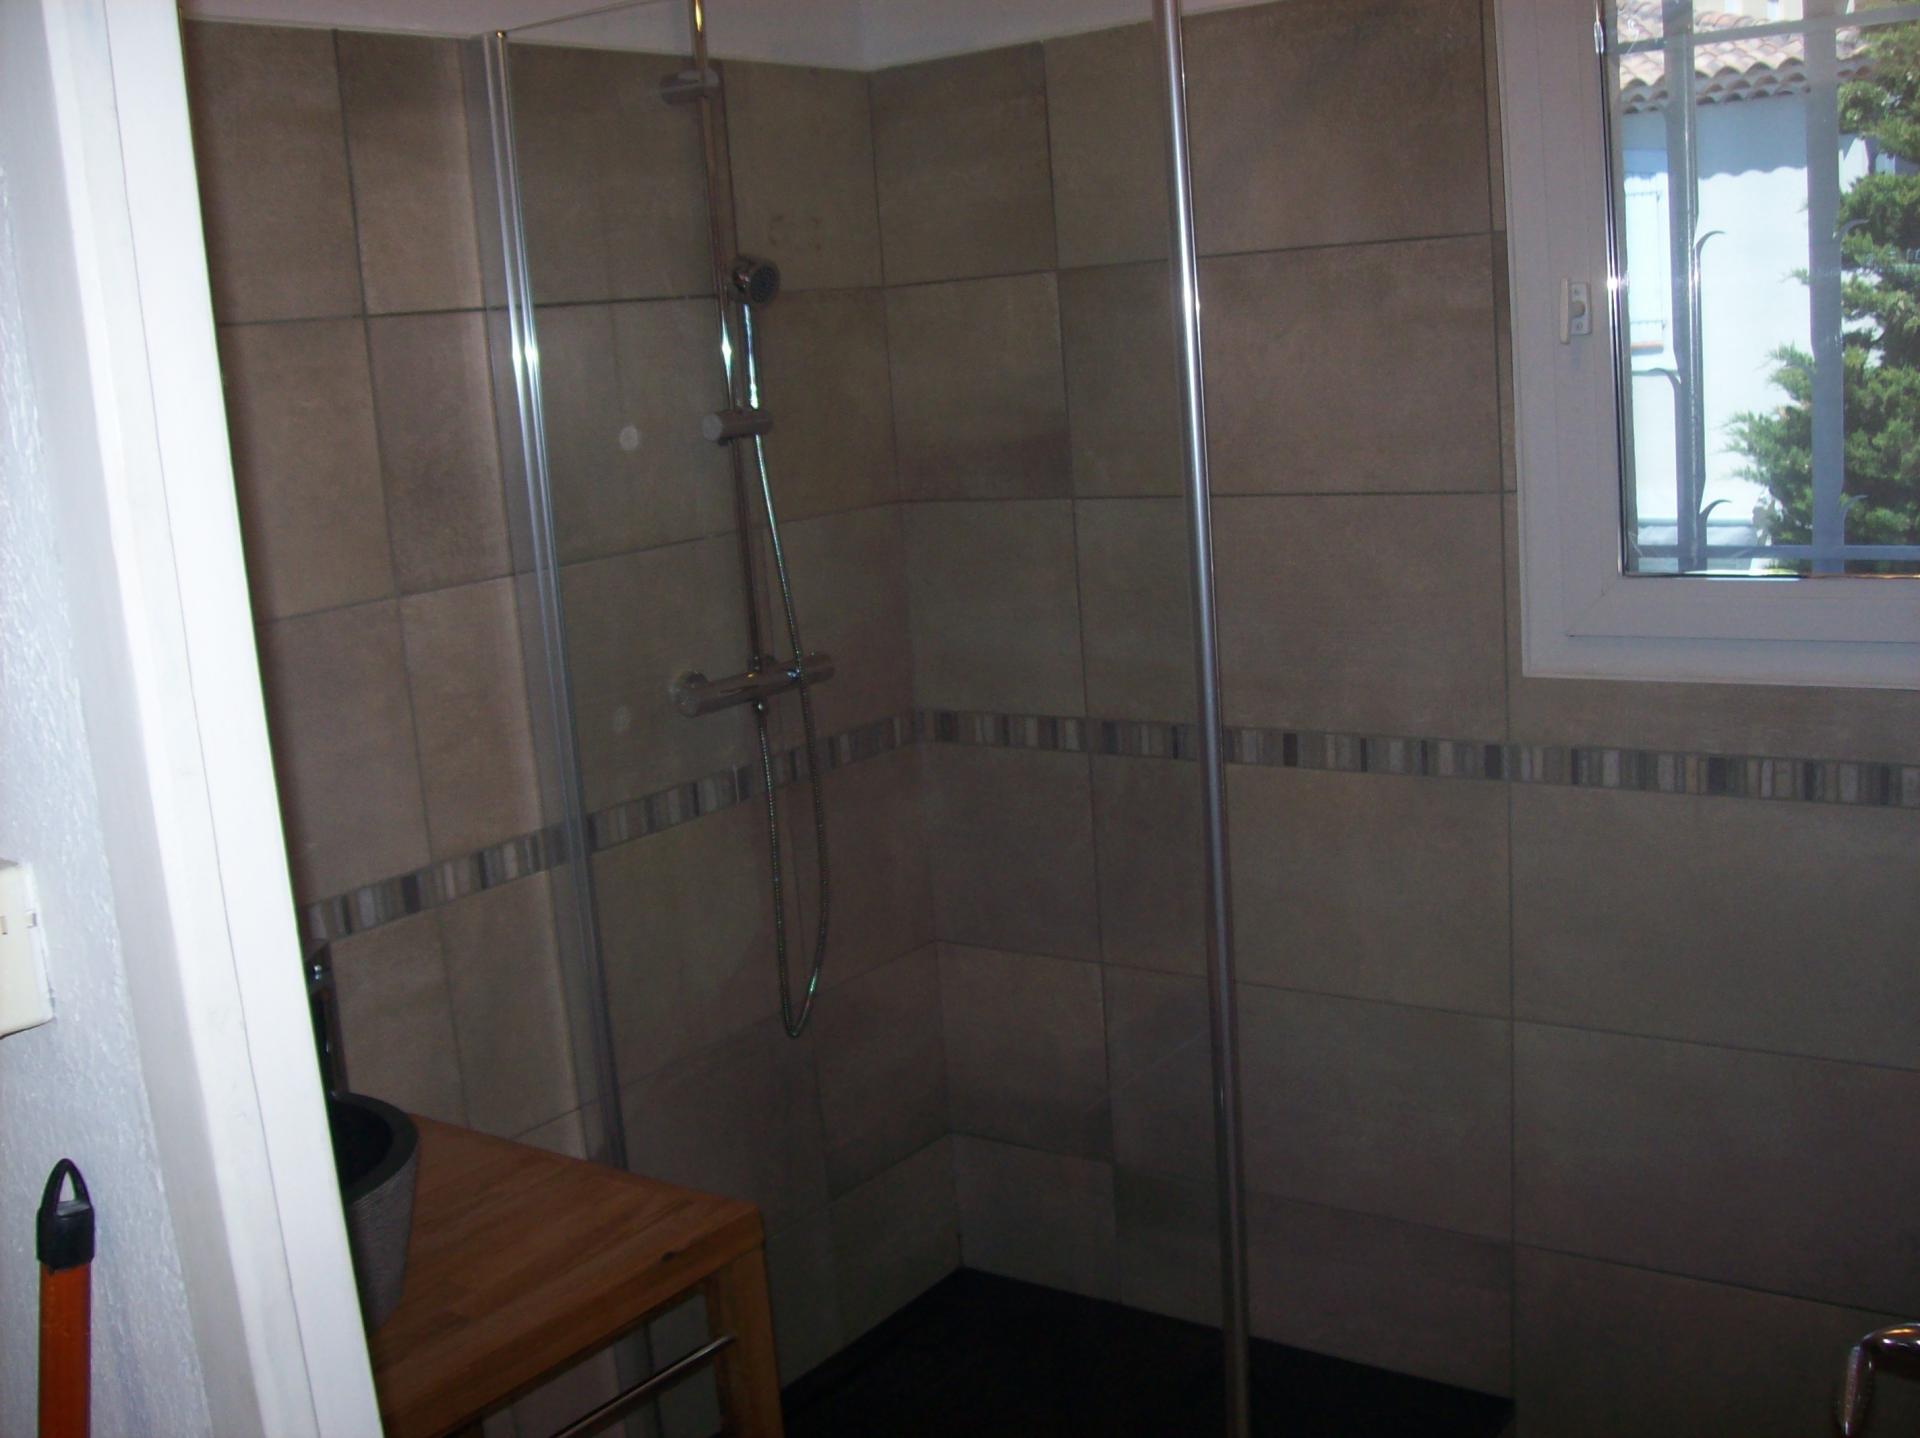 artisan carreleur r novation salle de bain aix marseille. Black Bedroom Furniture Sets. Home Design Ideas